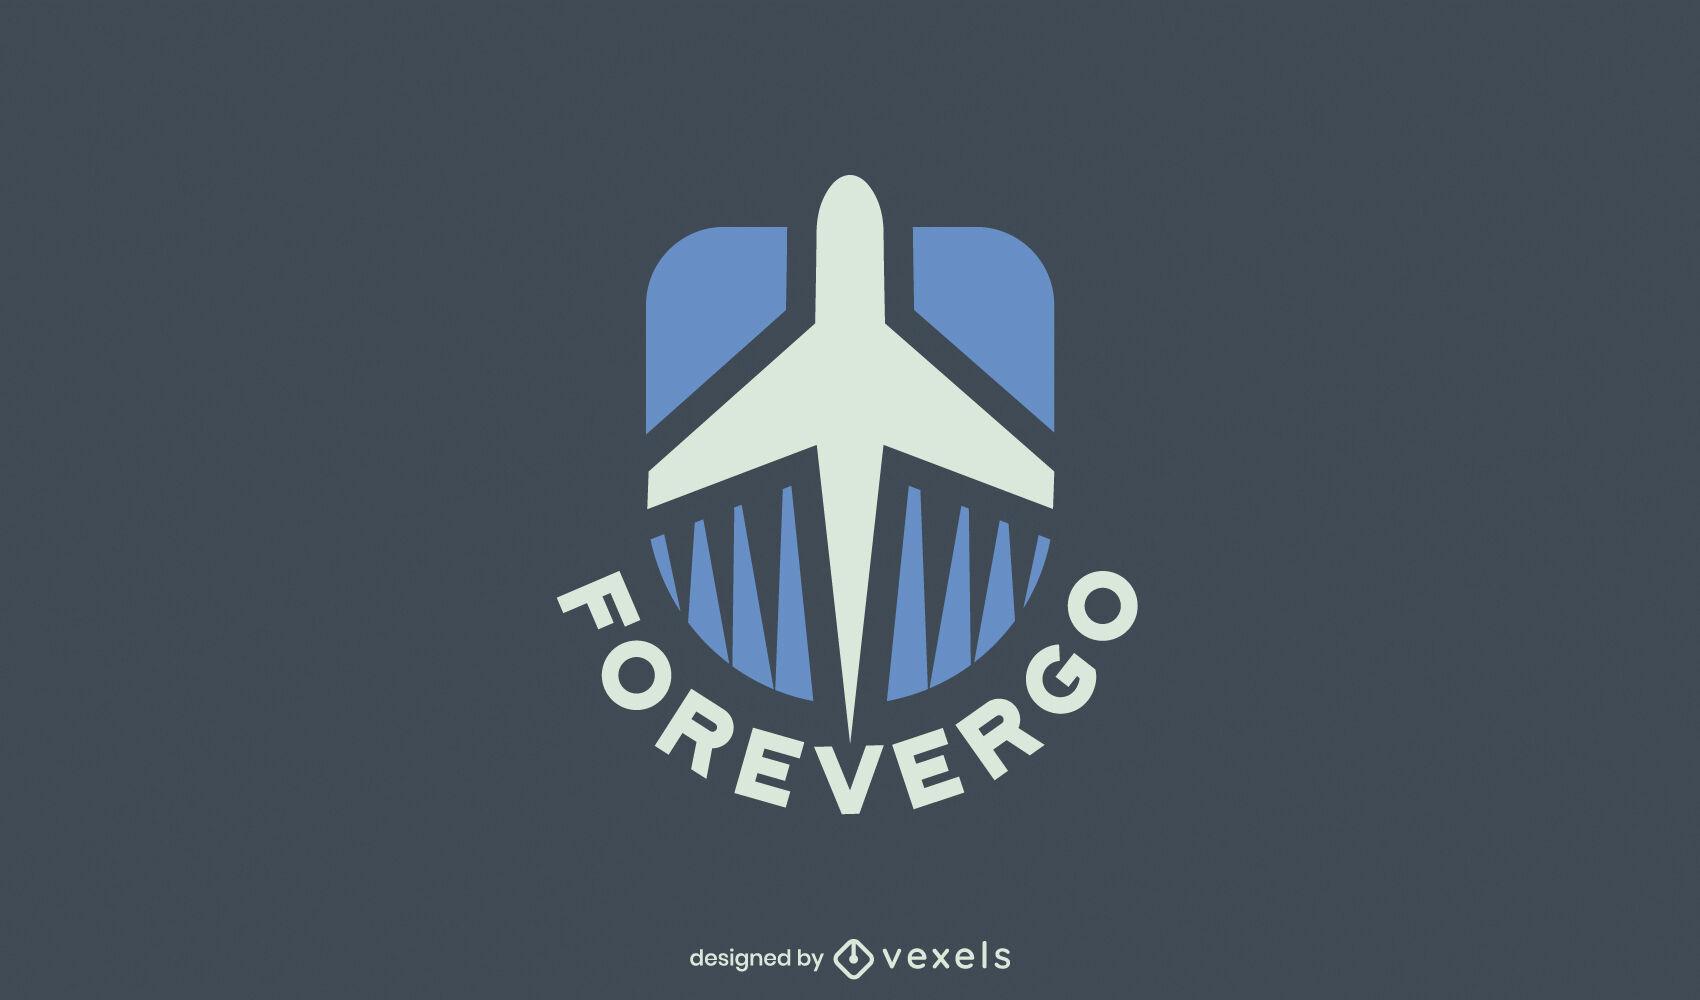 Tolles Flugzeug-Logo-Design